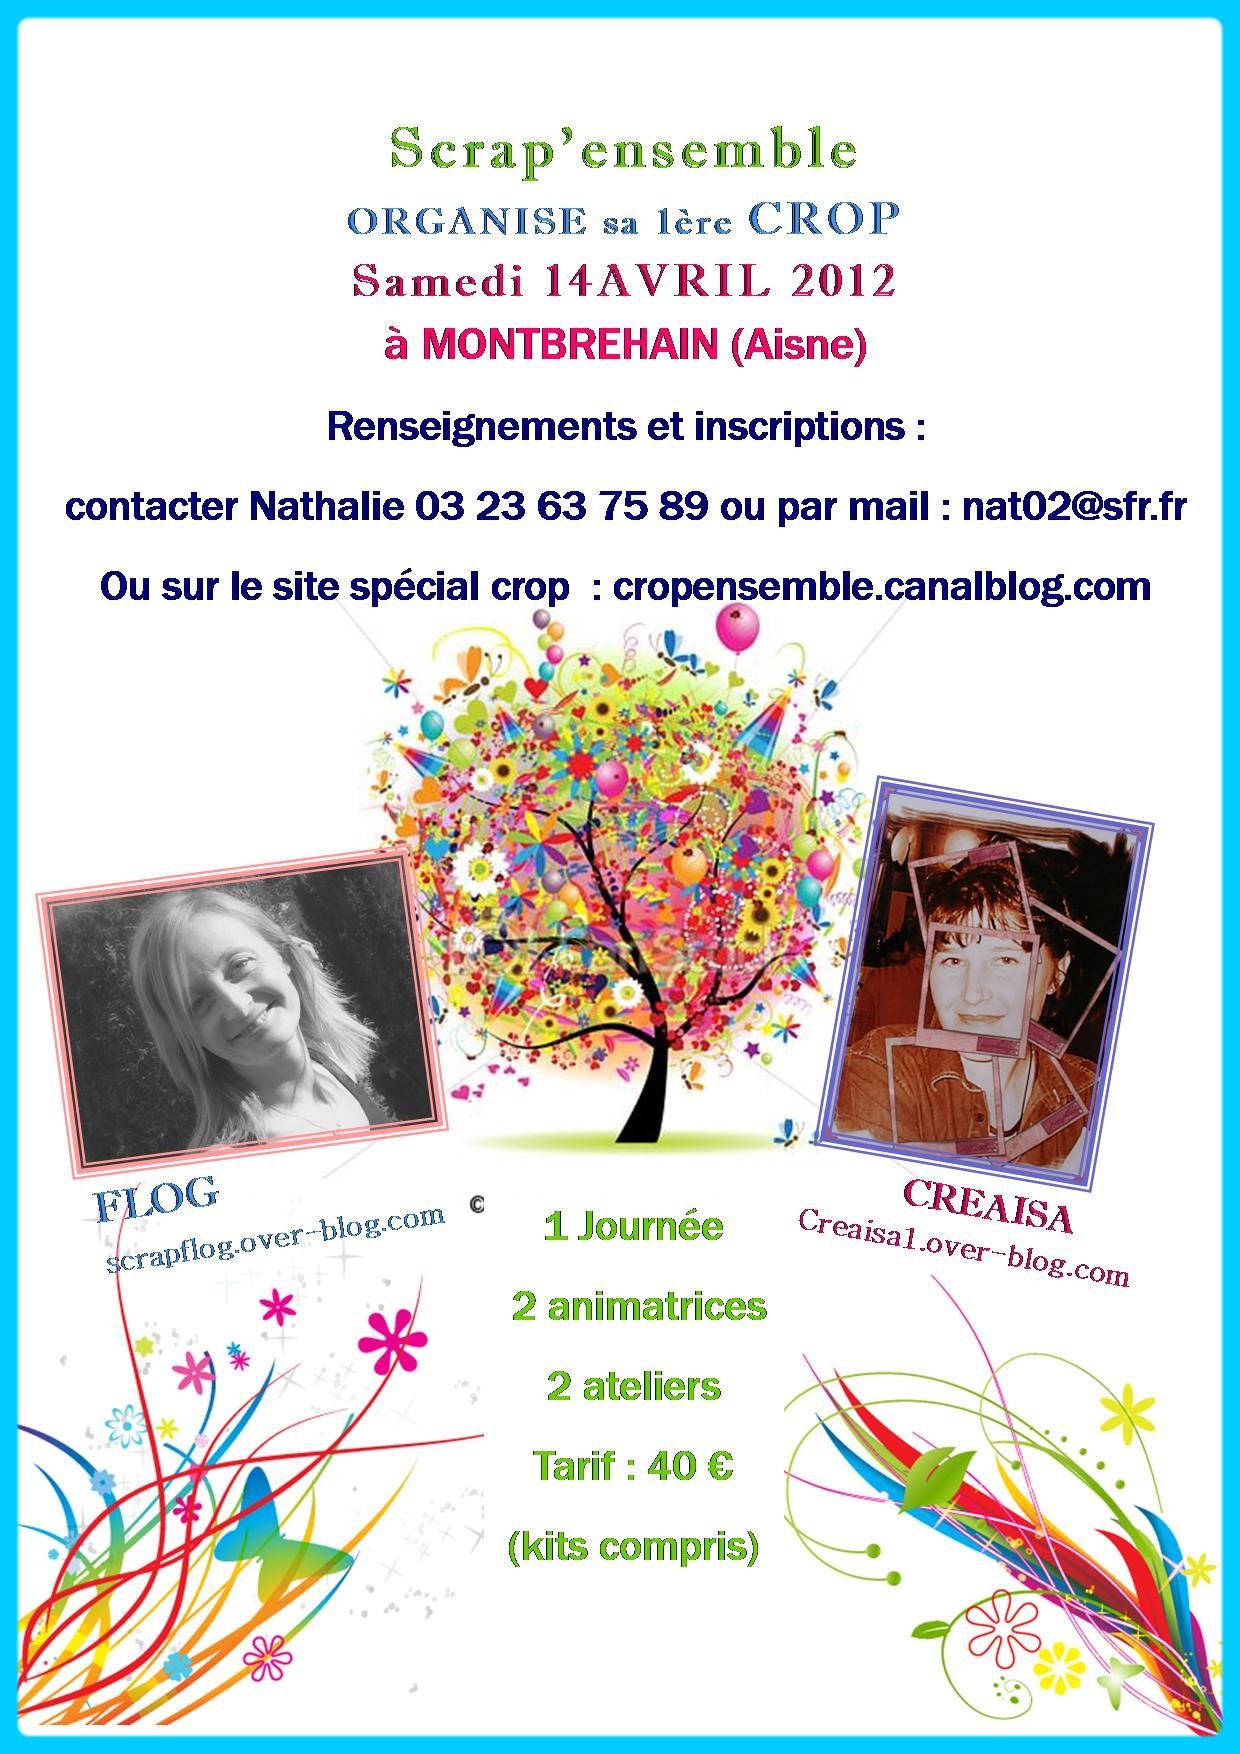 http://www.creaisa.fr/Photos/2012_04_14 affiche crop Aisne.jpg